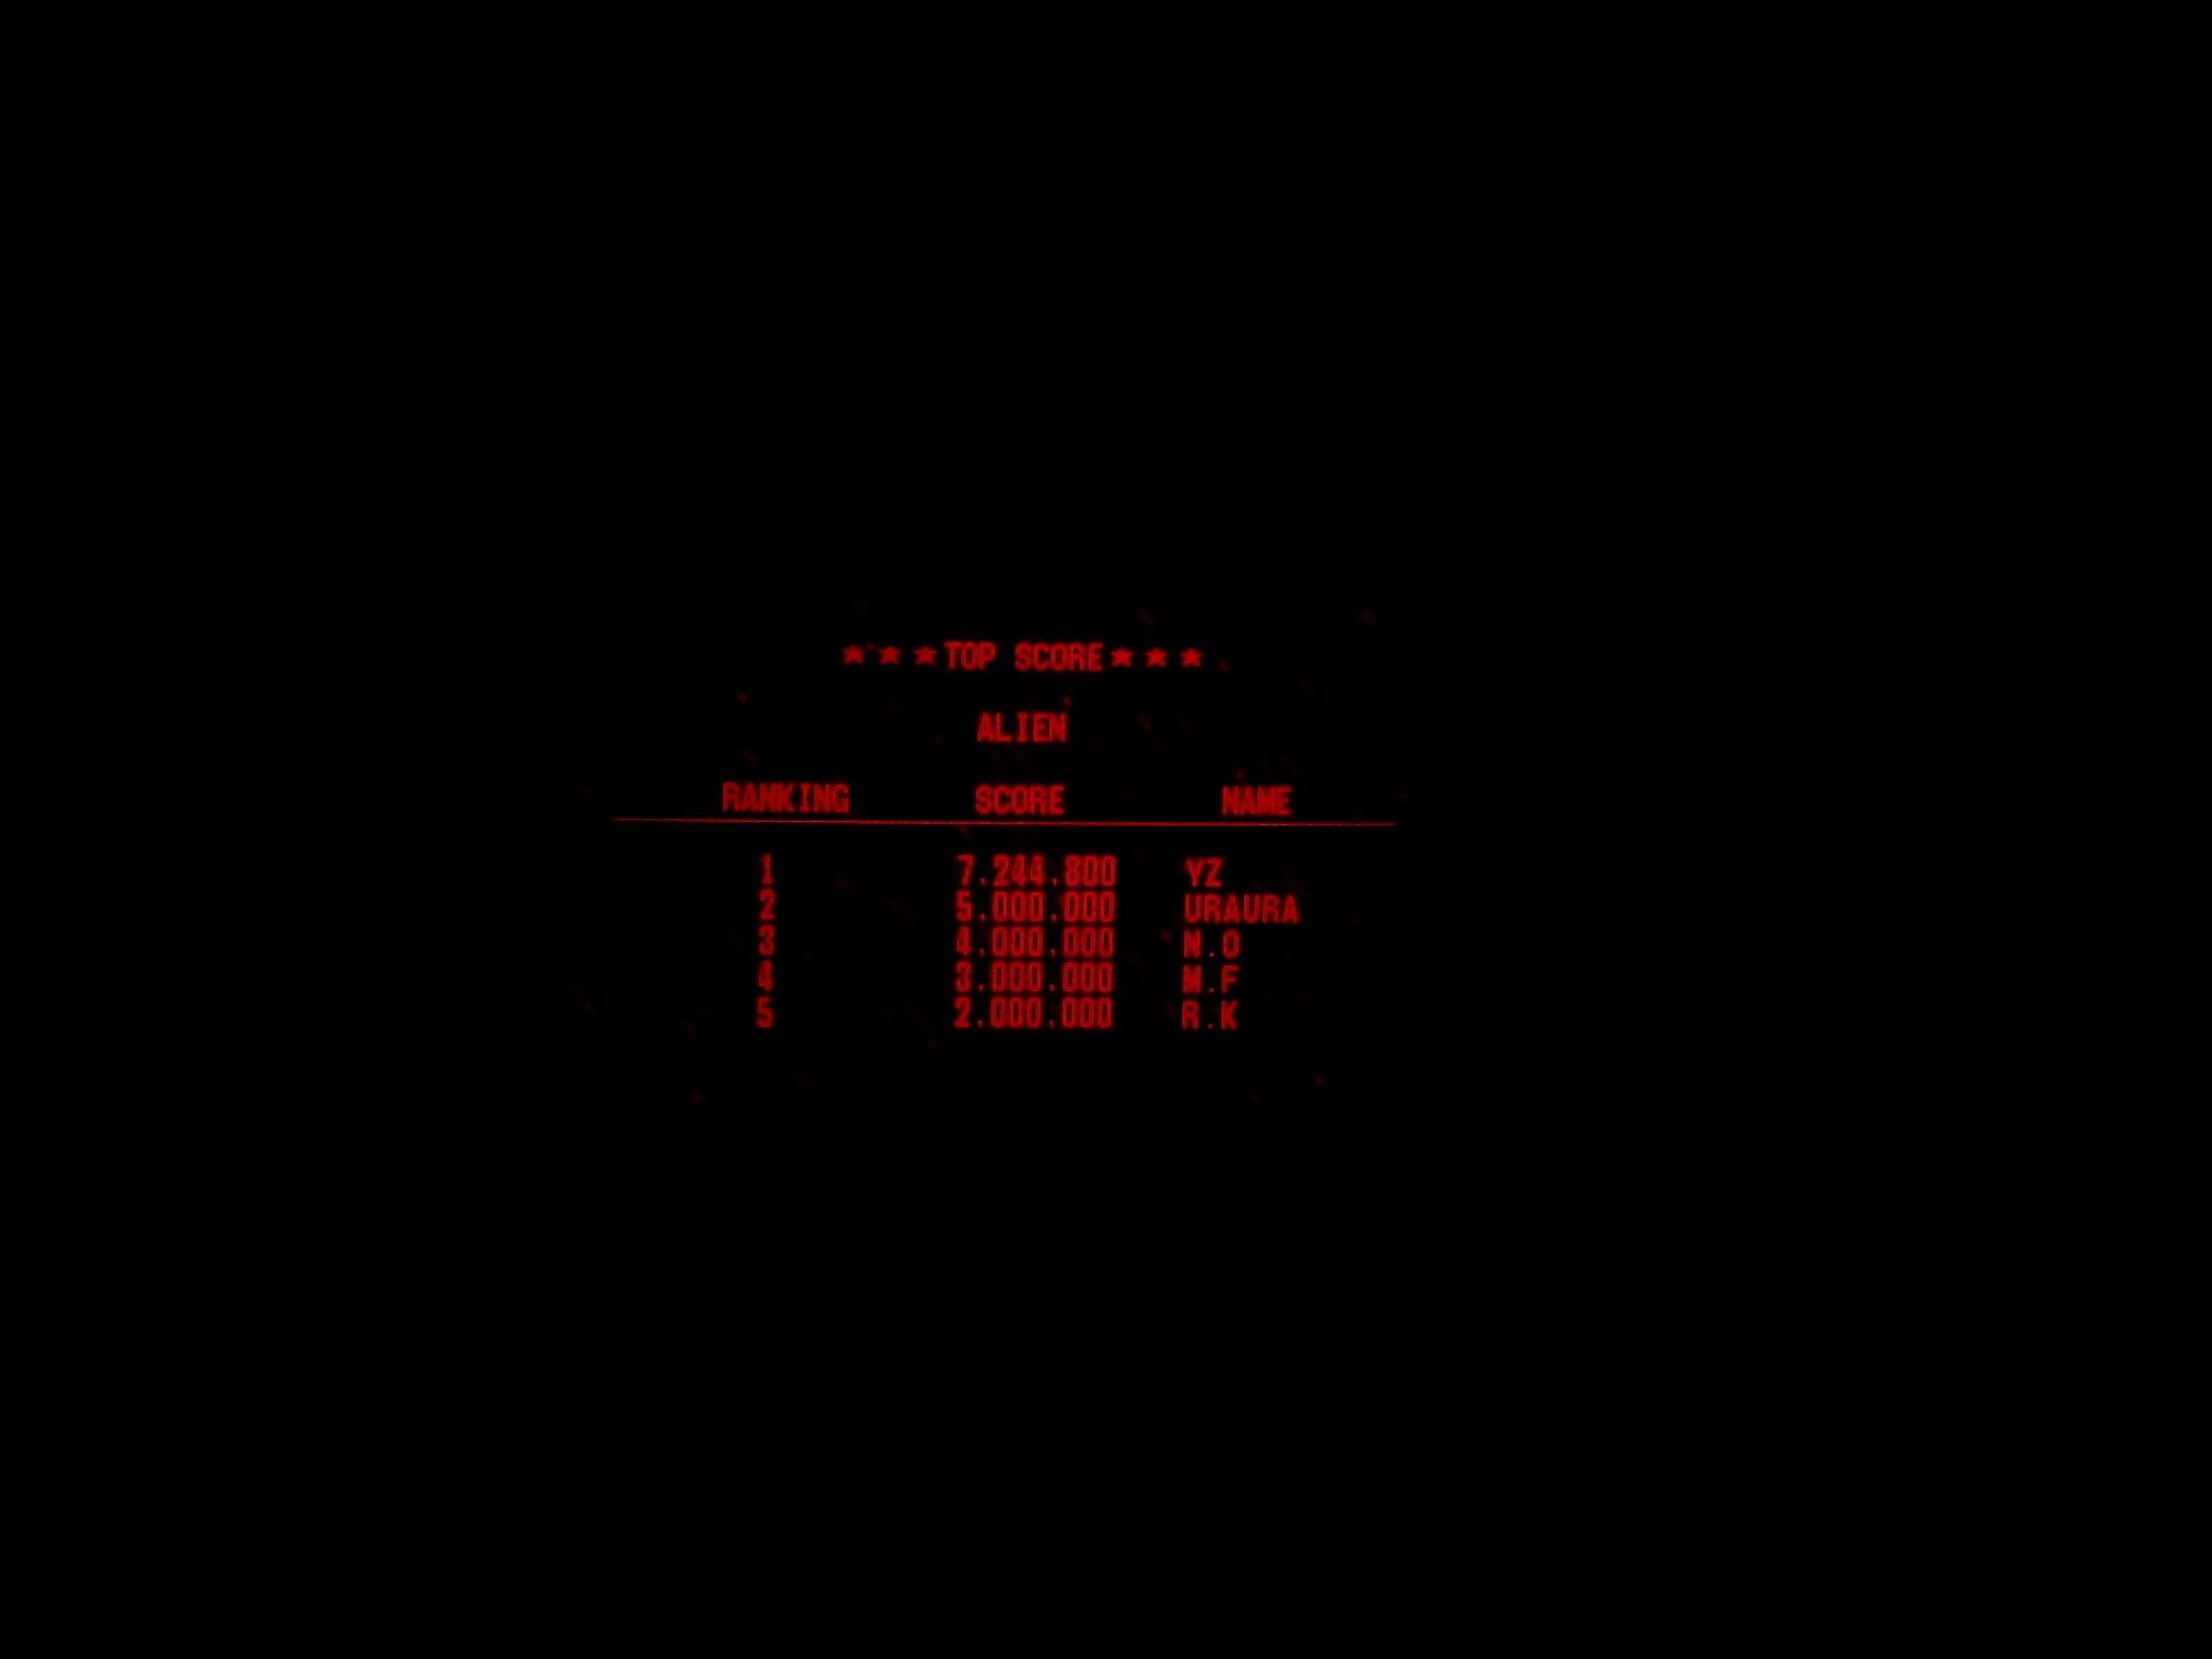 Galactic Pinball: Alien 7,244,800 points